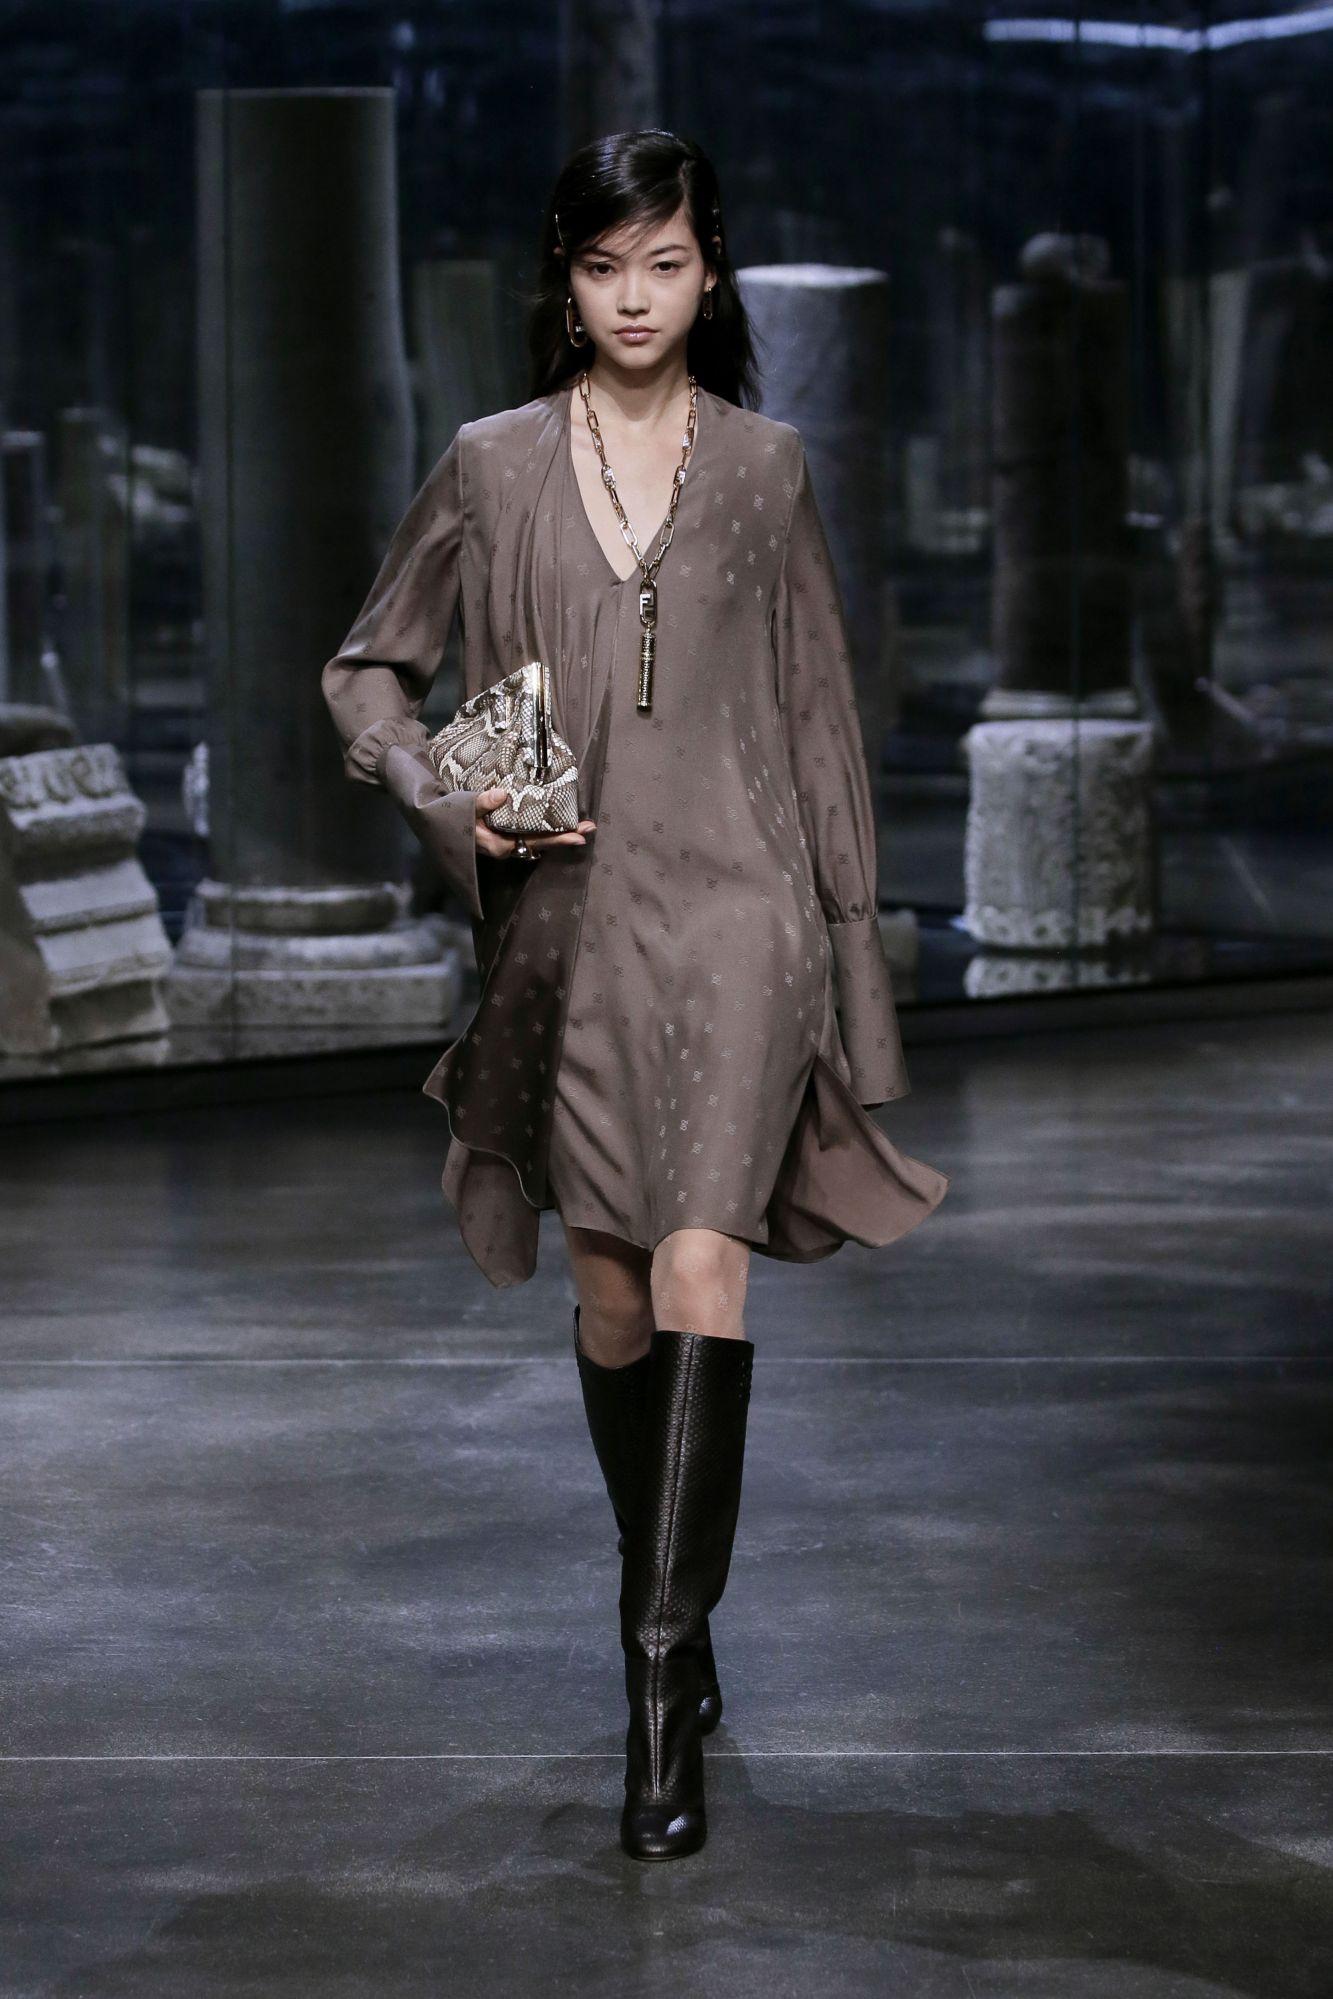 13 New Bags From Fendi's Fall-Winter 2021 Show by Kim Jones and Silvia Venturini Fendi